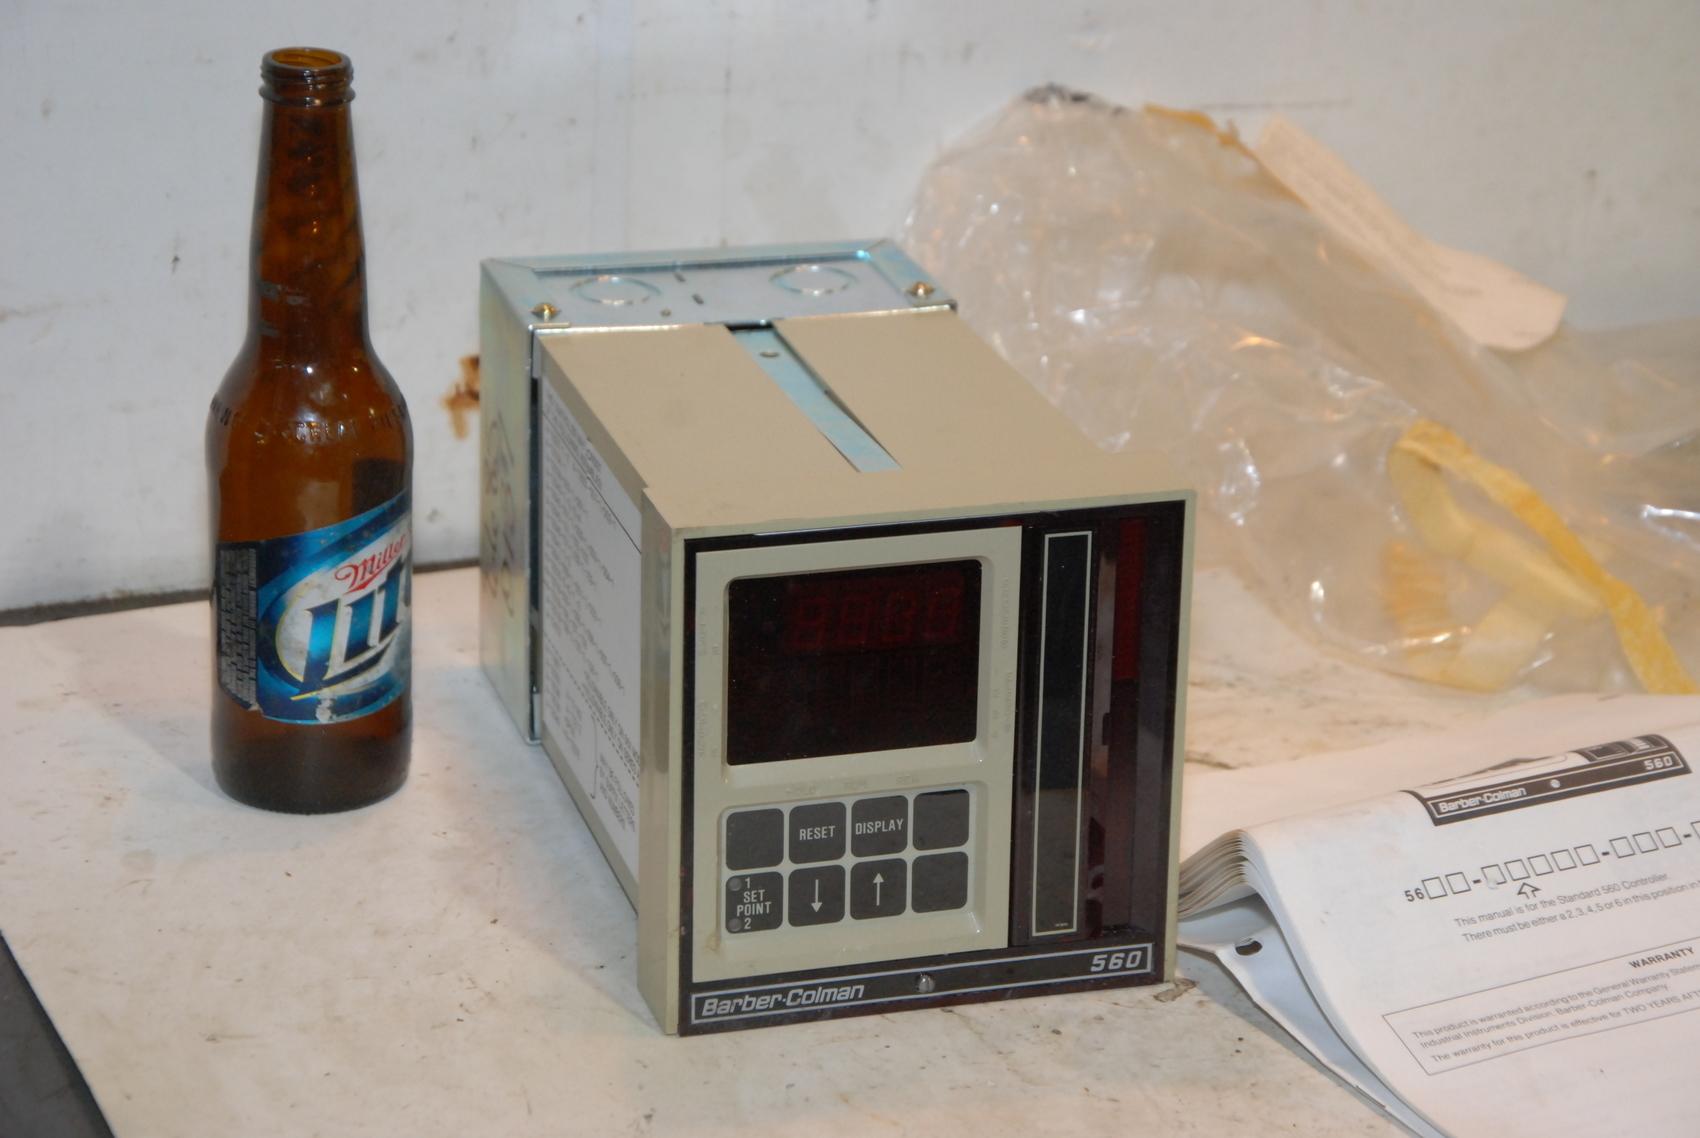 NEW Barber-Colman 560 Temperature Controller